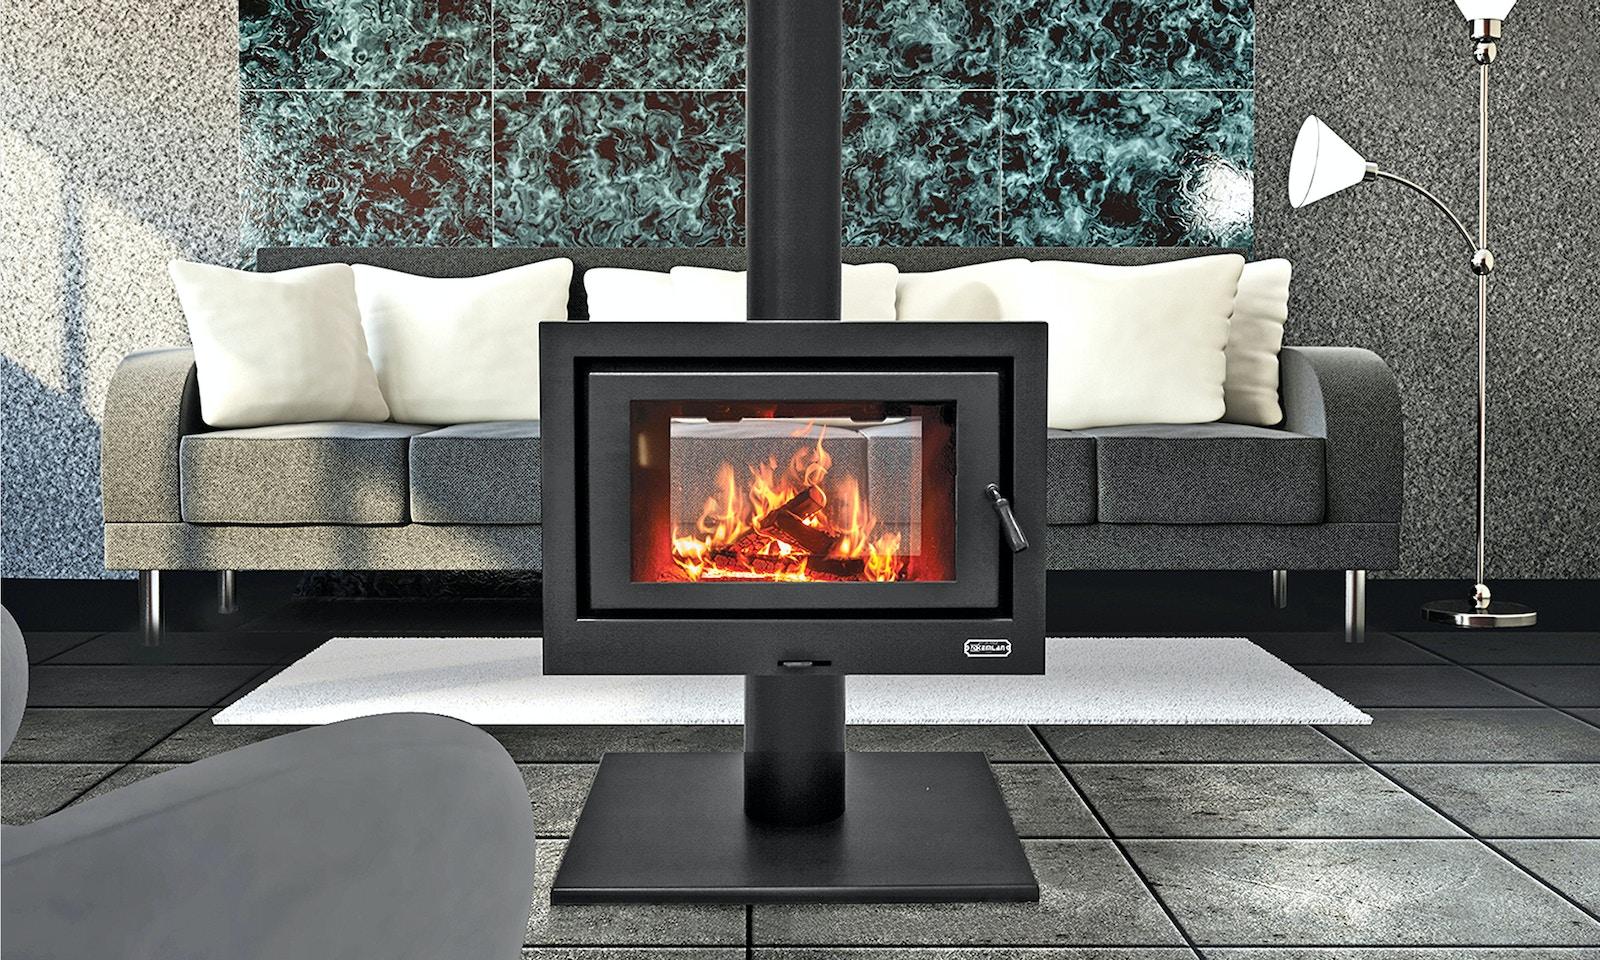 An Australian Fireplace for Australian Conditions